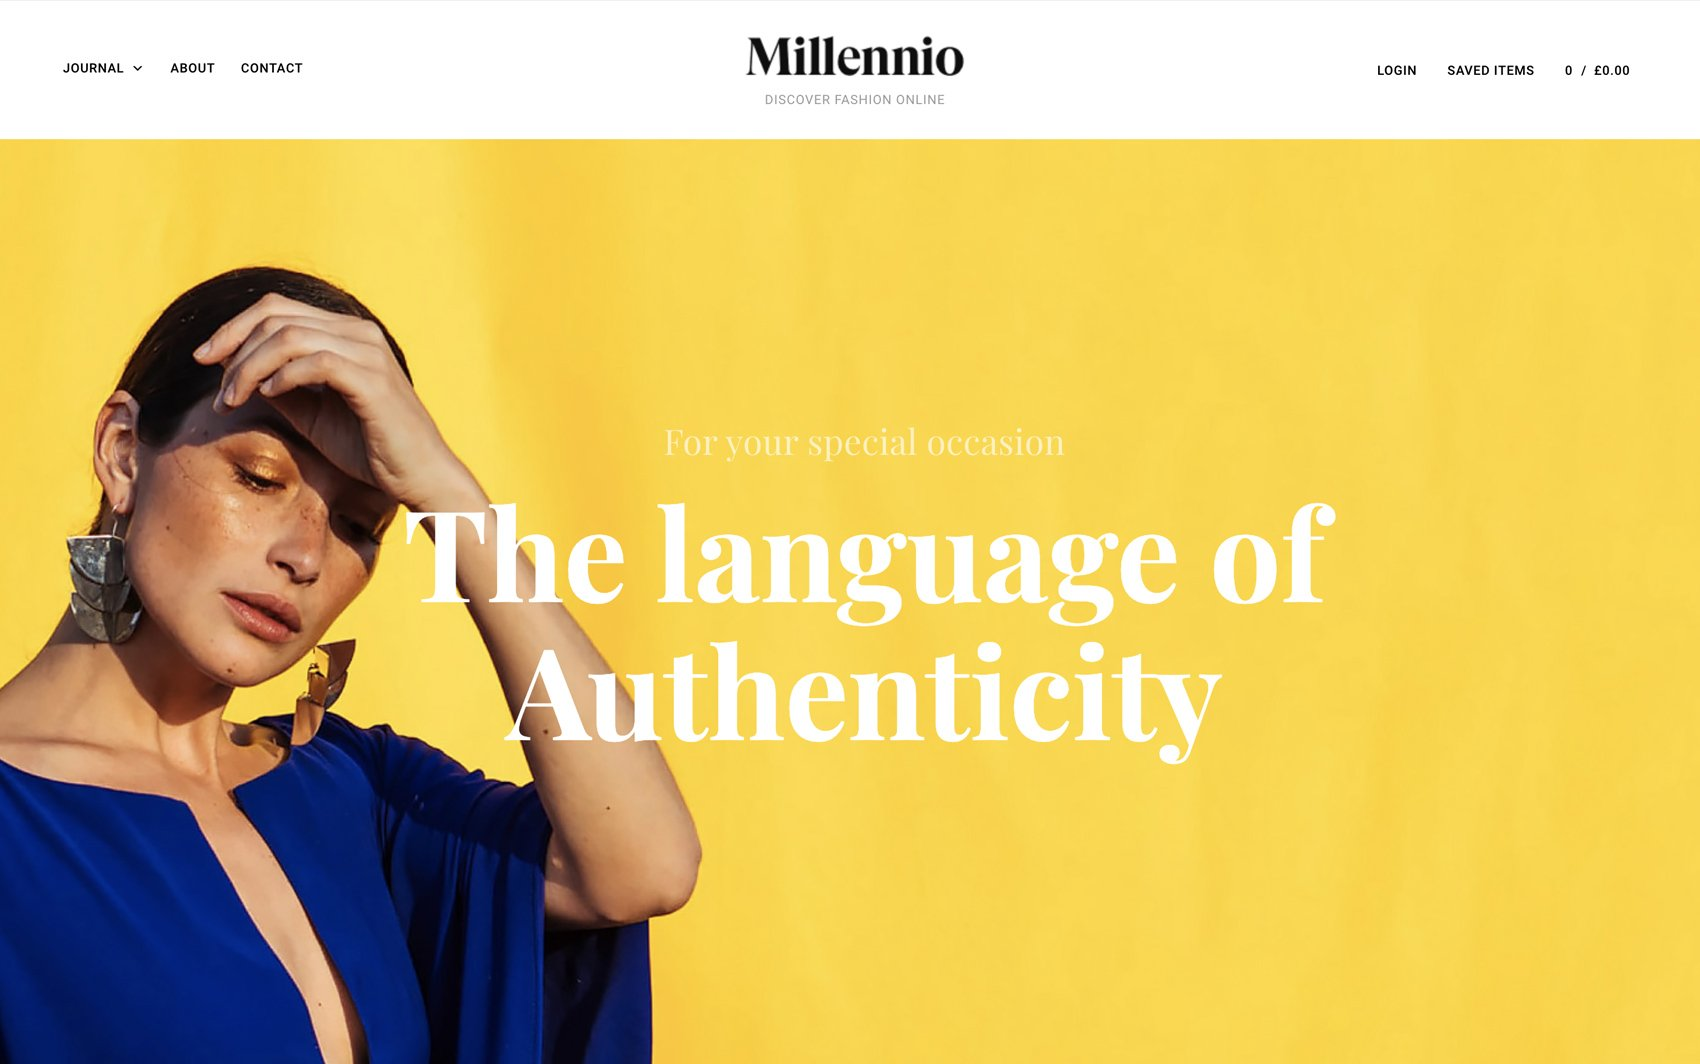 Themes Kingdom Millennio